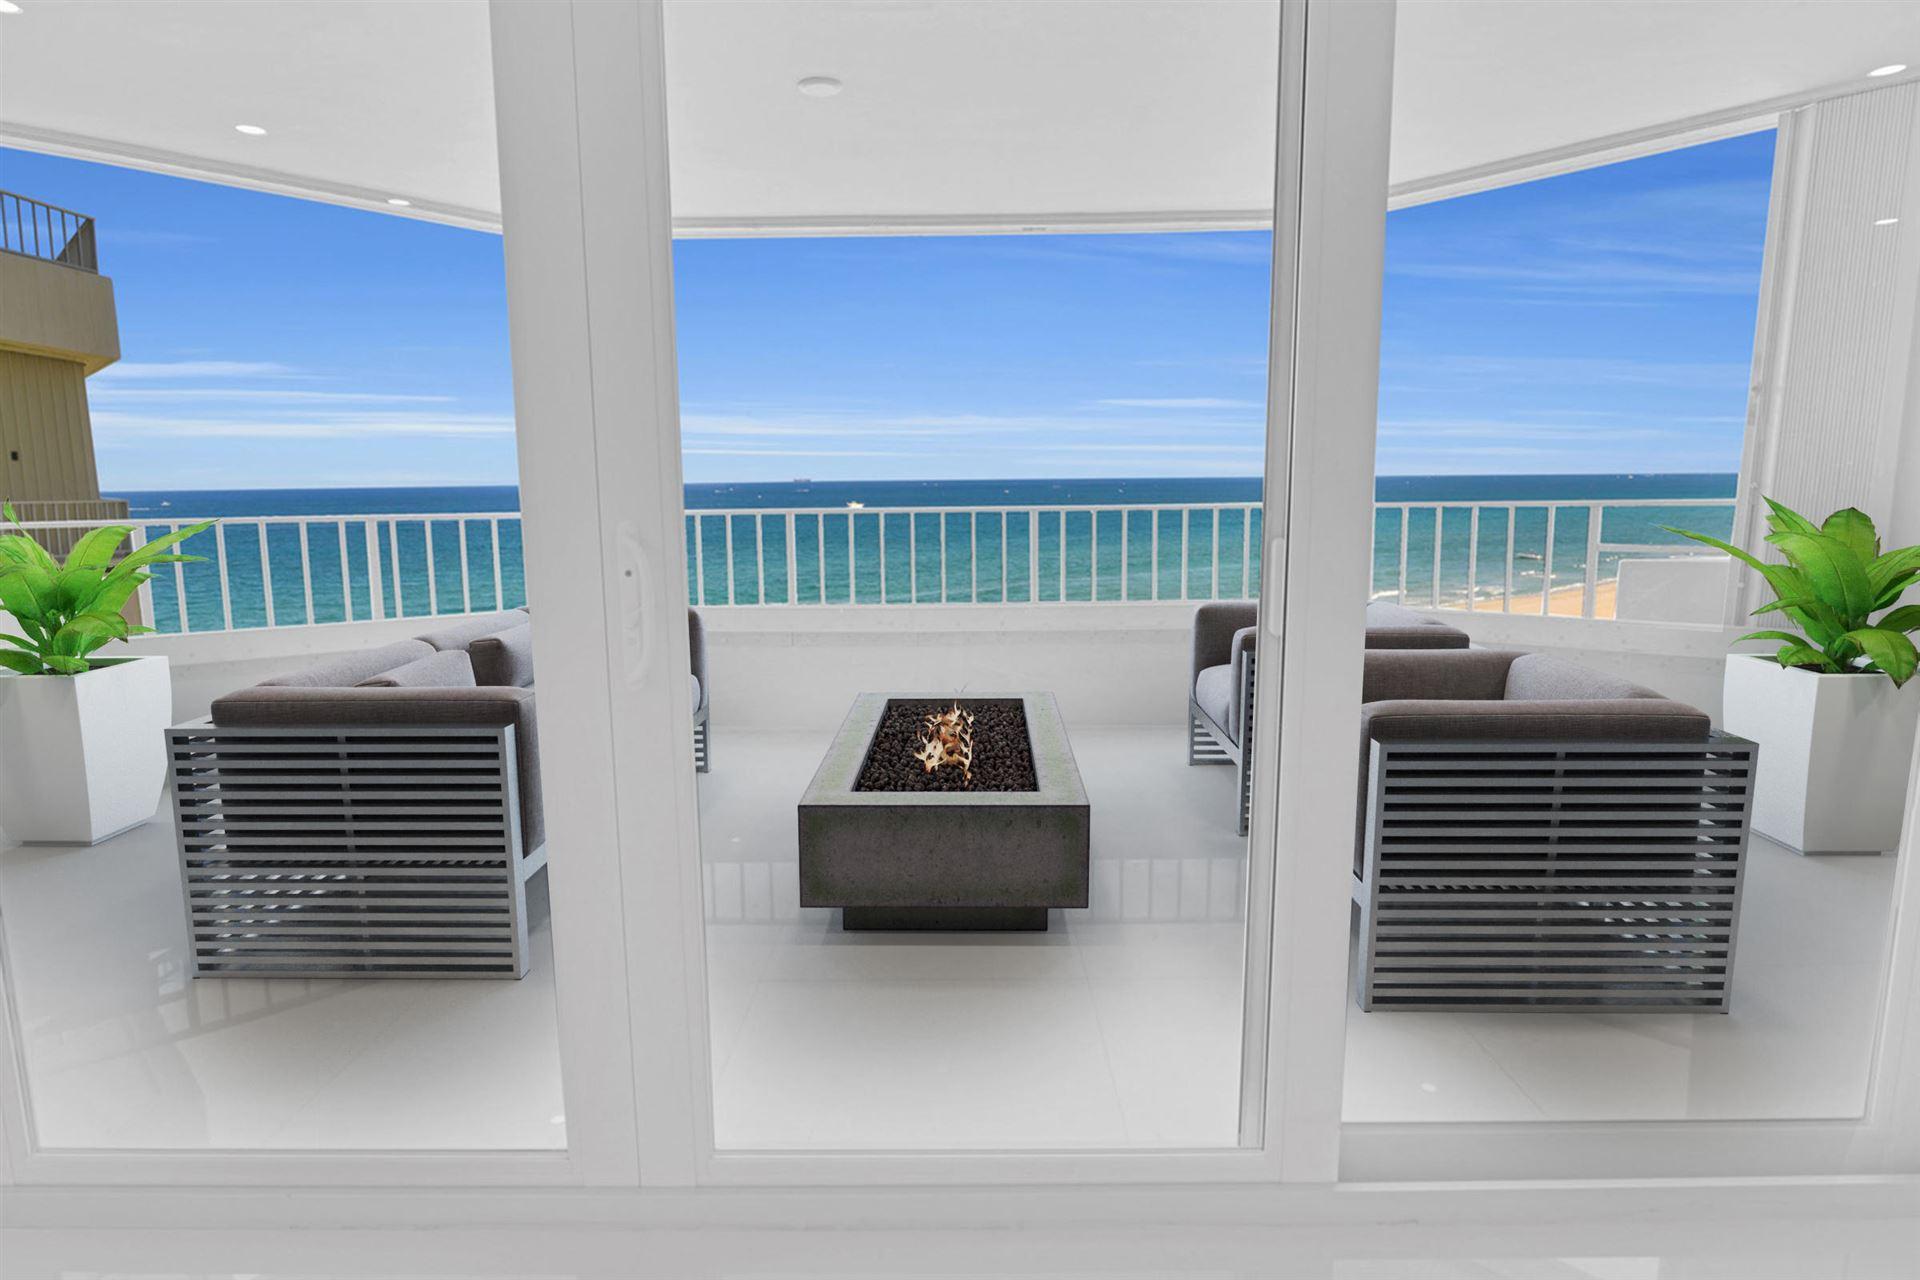 500 S Ocean Boulevard #906, Boca Raton, FL 33432 - #: RX-10630826